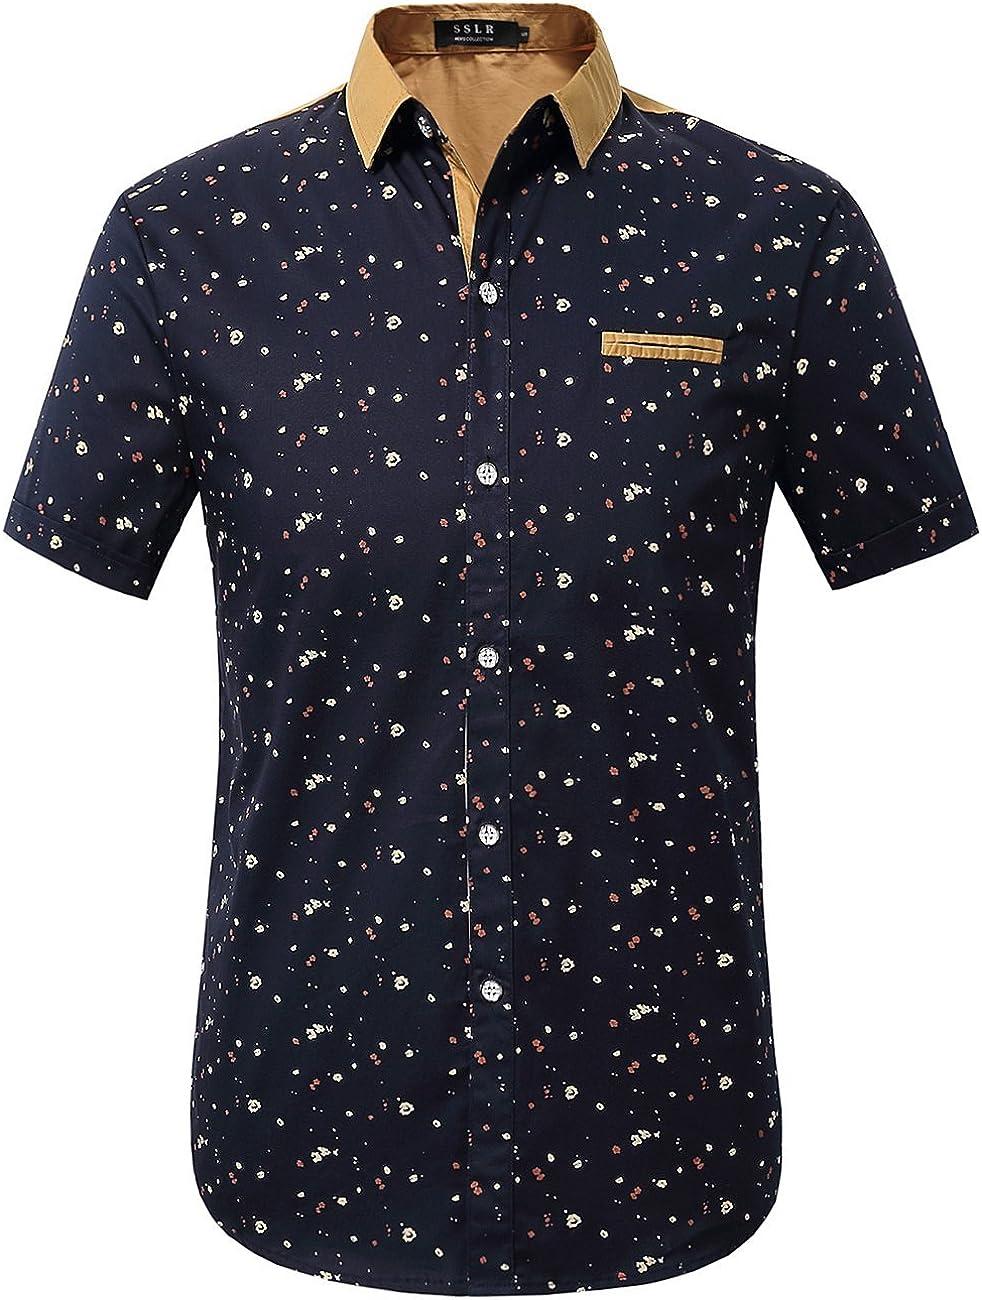 SSLR Mens Casual Shirts Printed Cotton Short Sleeve Button Up Shirts for Men